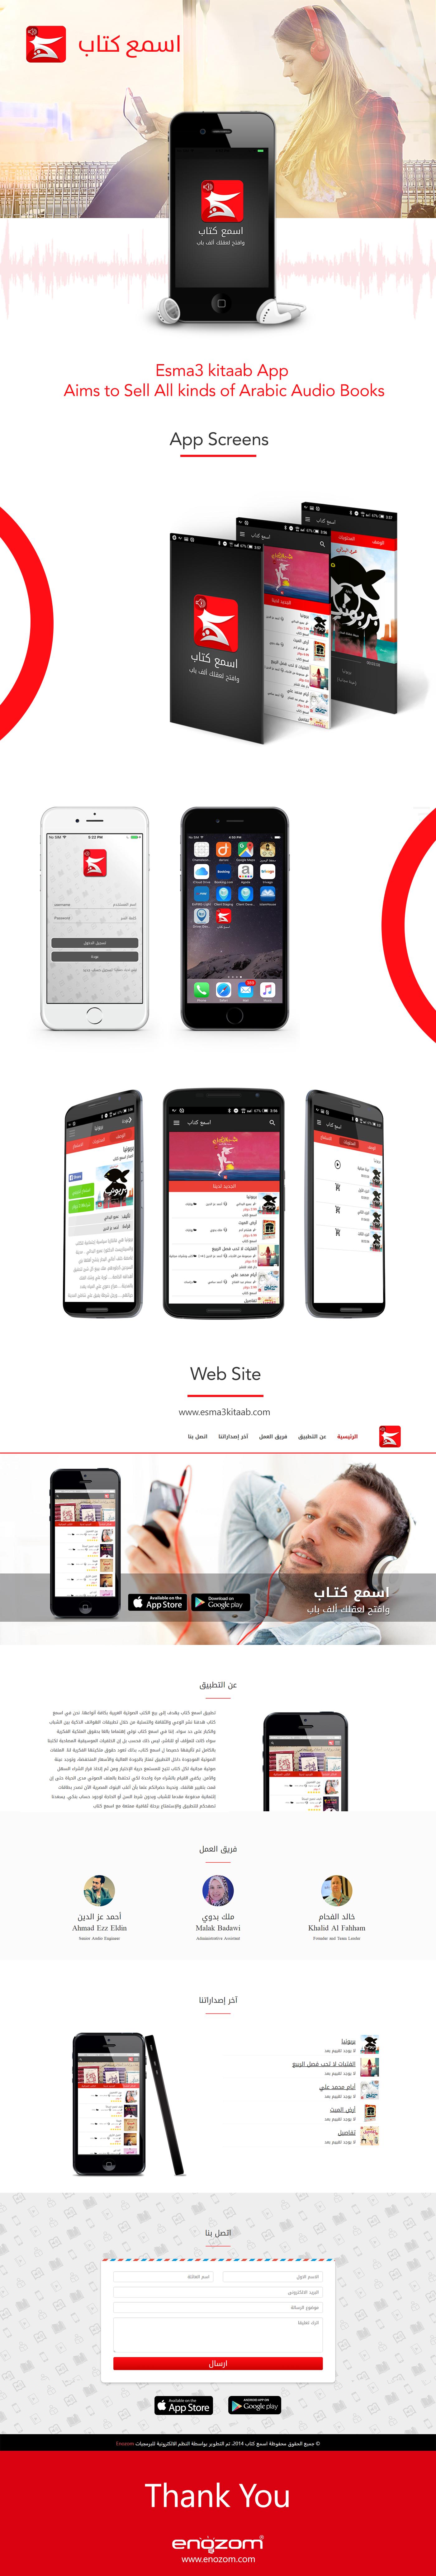 design app development Web Design